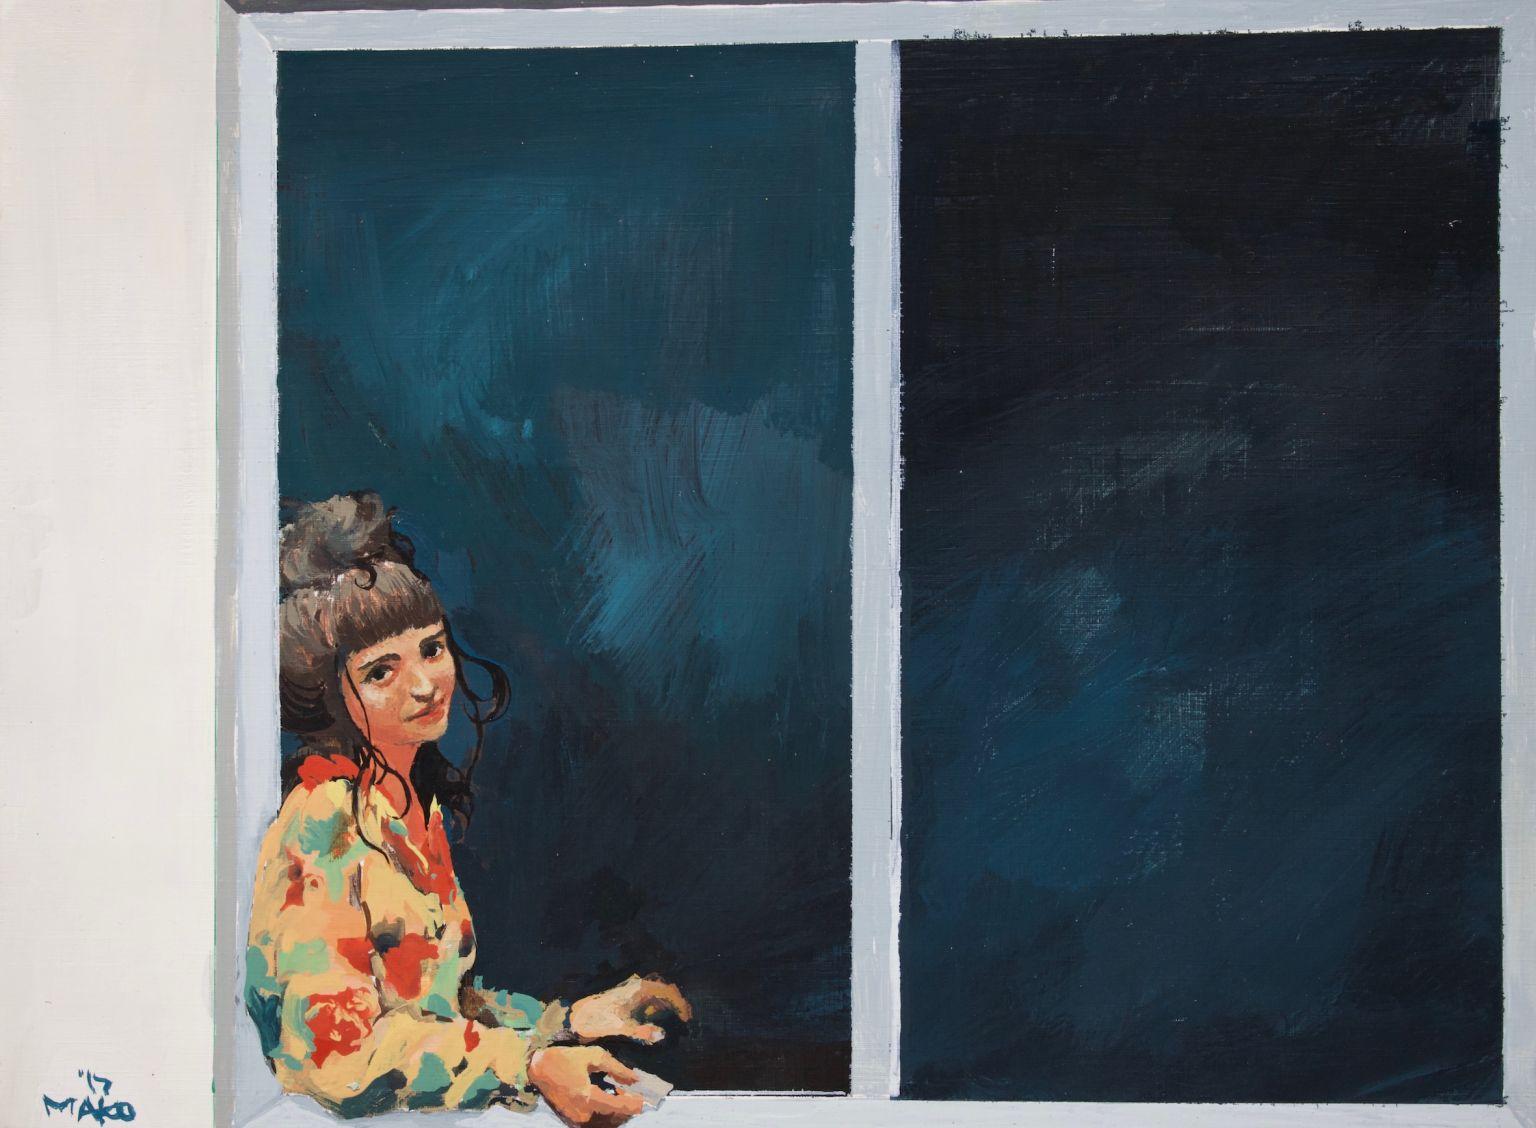 Chica en una ventana (2017) - Mako Moya